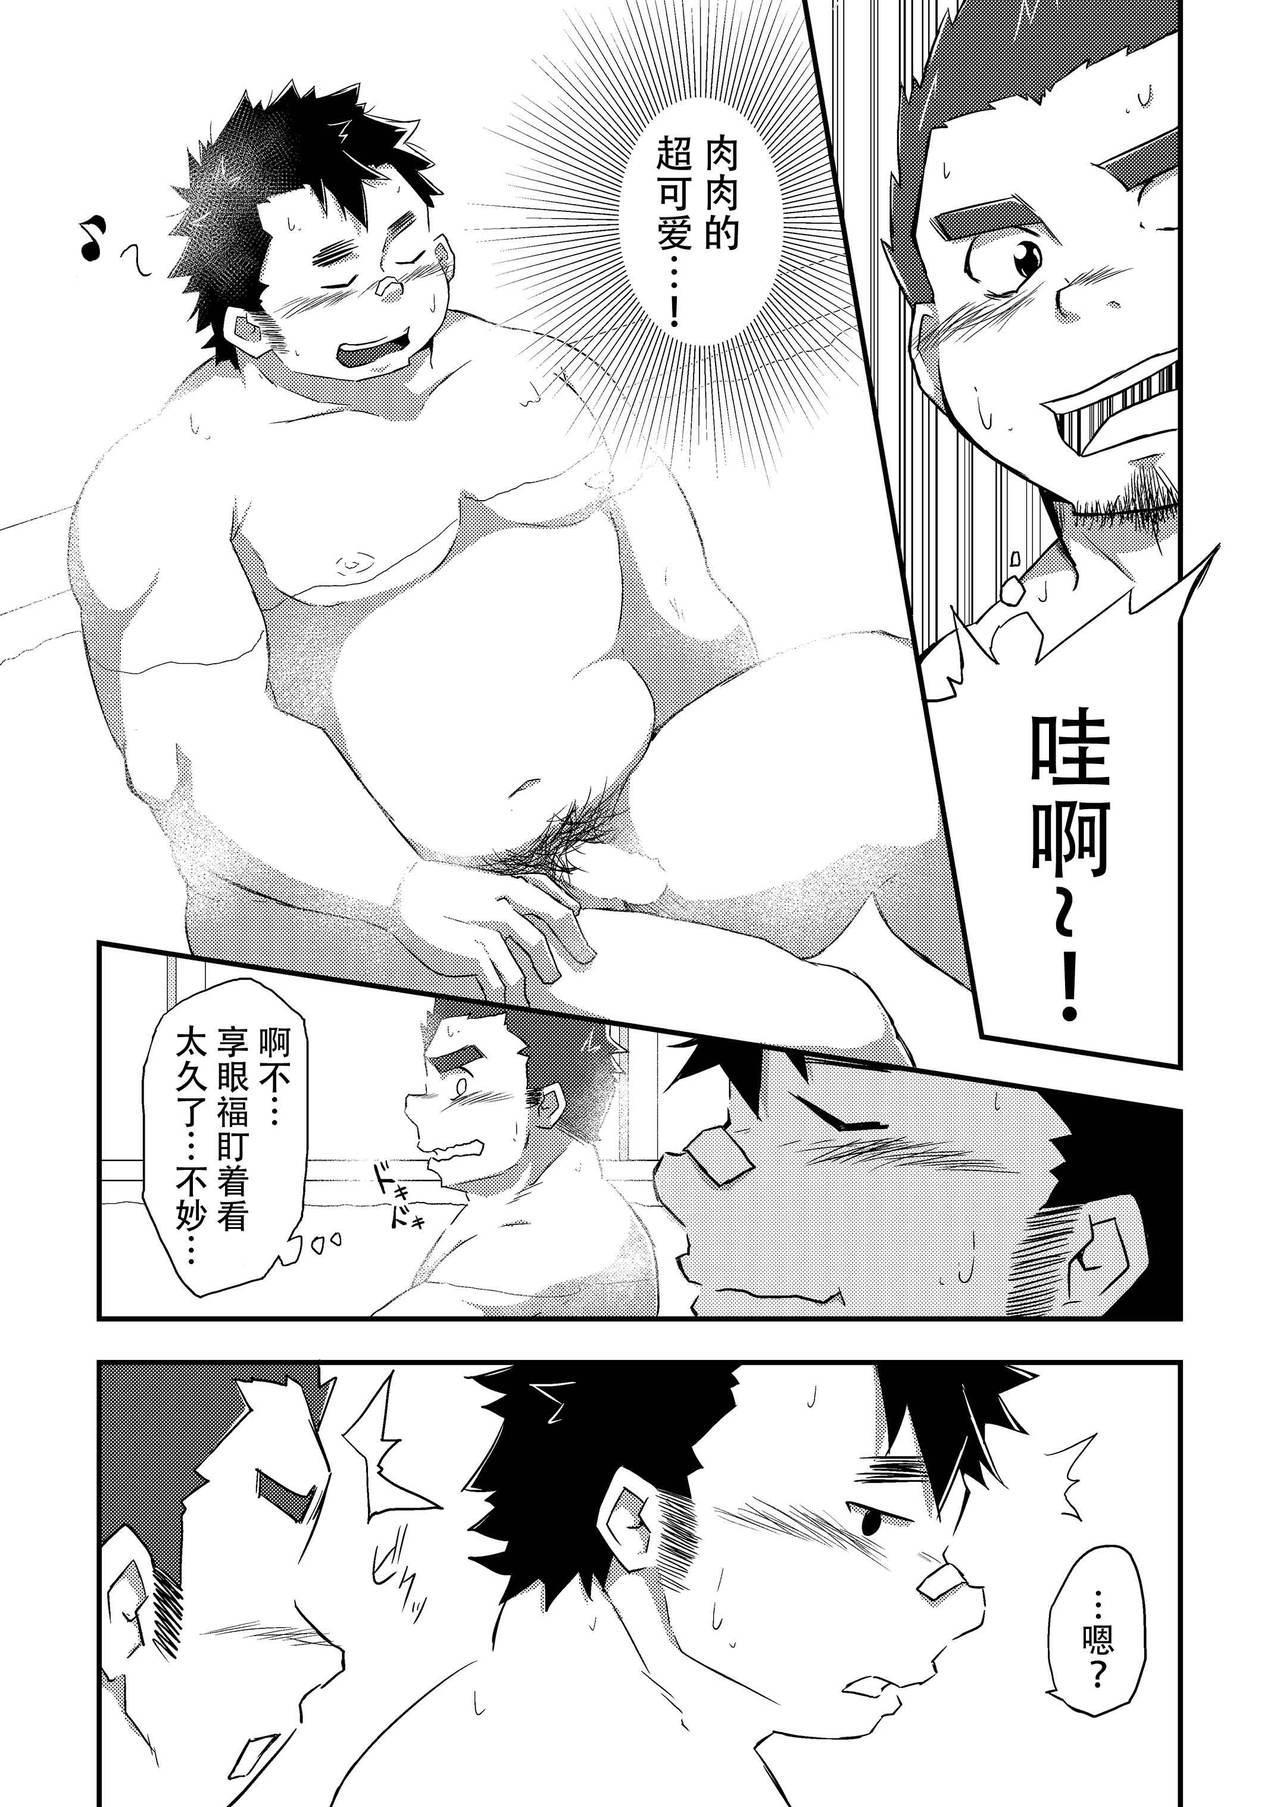 [CorkBOX (ngng)] Ise-kun wa Tamatte Iru. - Ise-kun is horny. [Chinese] {日曜日汉化} [Digital] 5